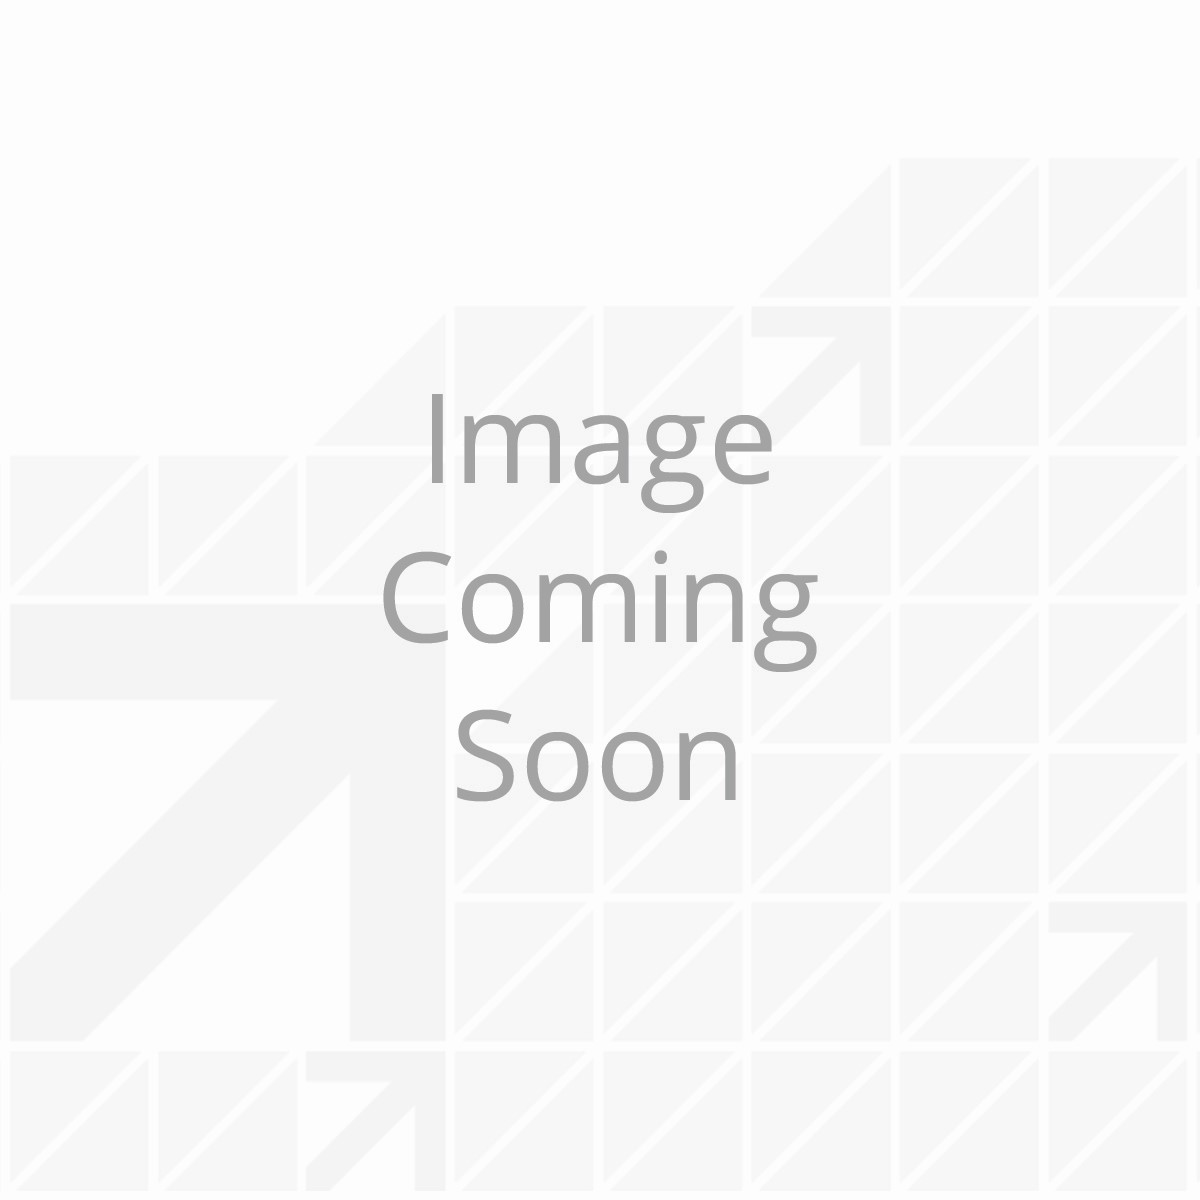 End Cap for Motor Cover - Electric Scissor Jack